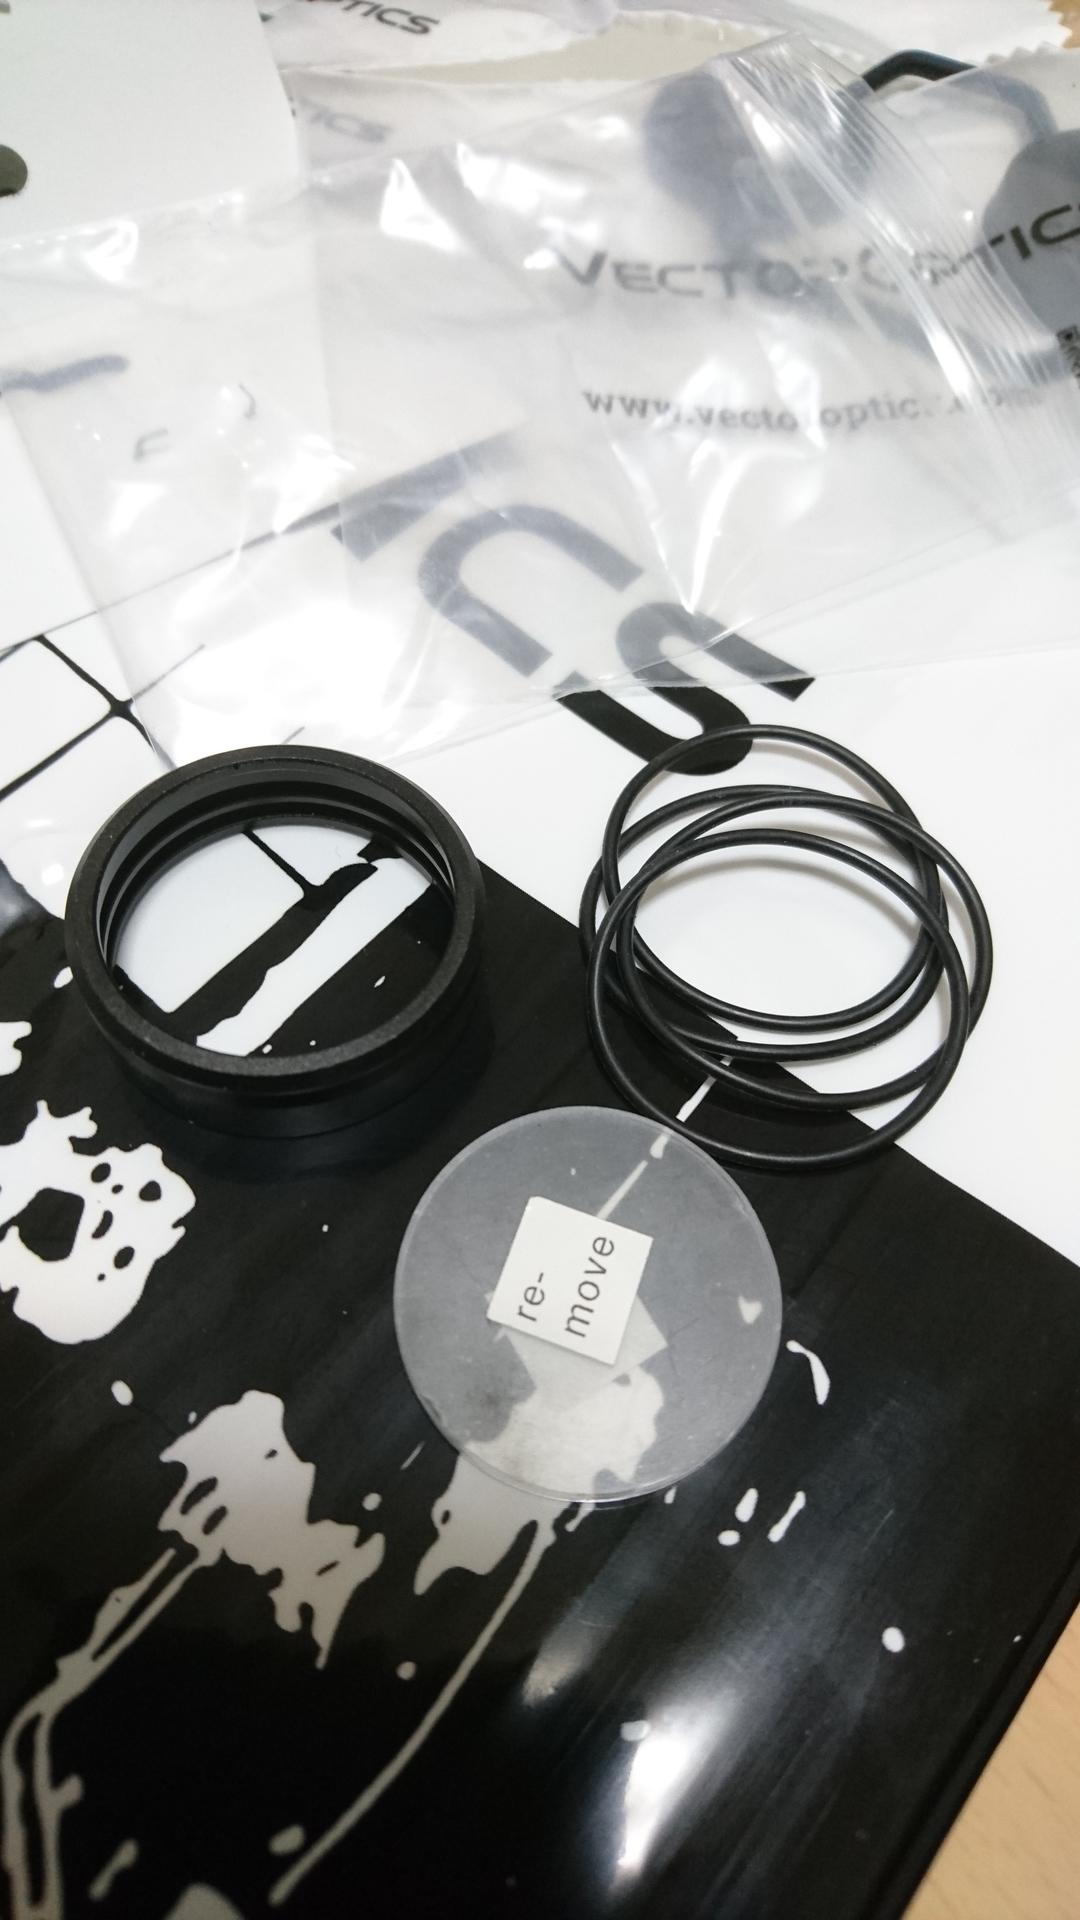 VectorOptics製 Maverick-Gen2 ドットサイト 保護レンズ内容物